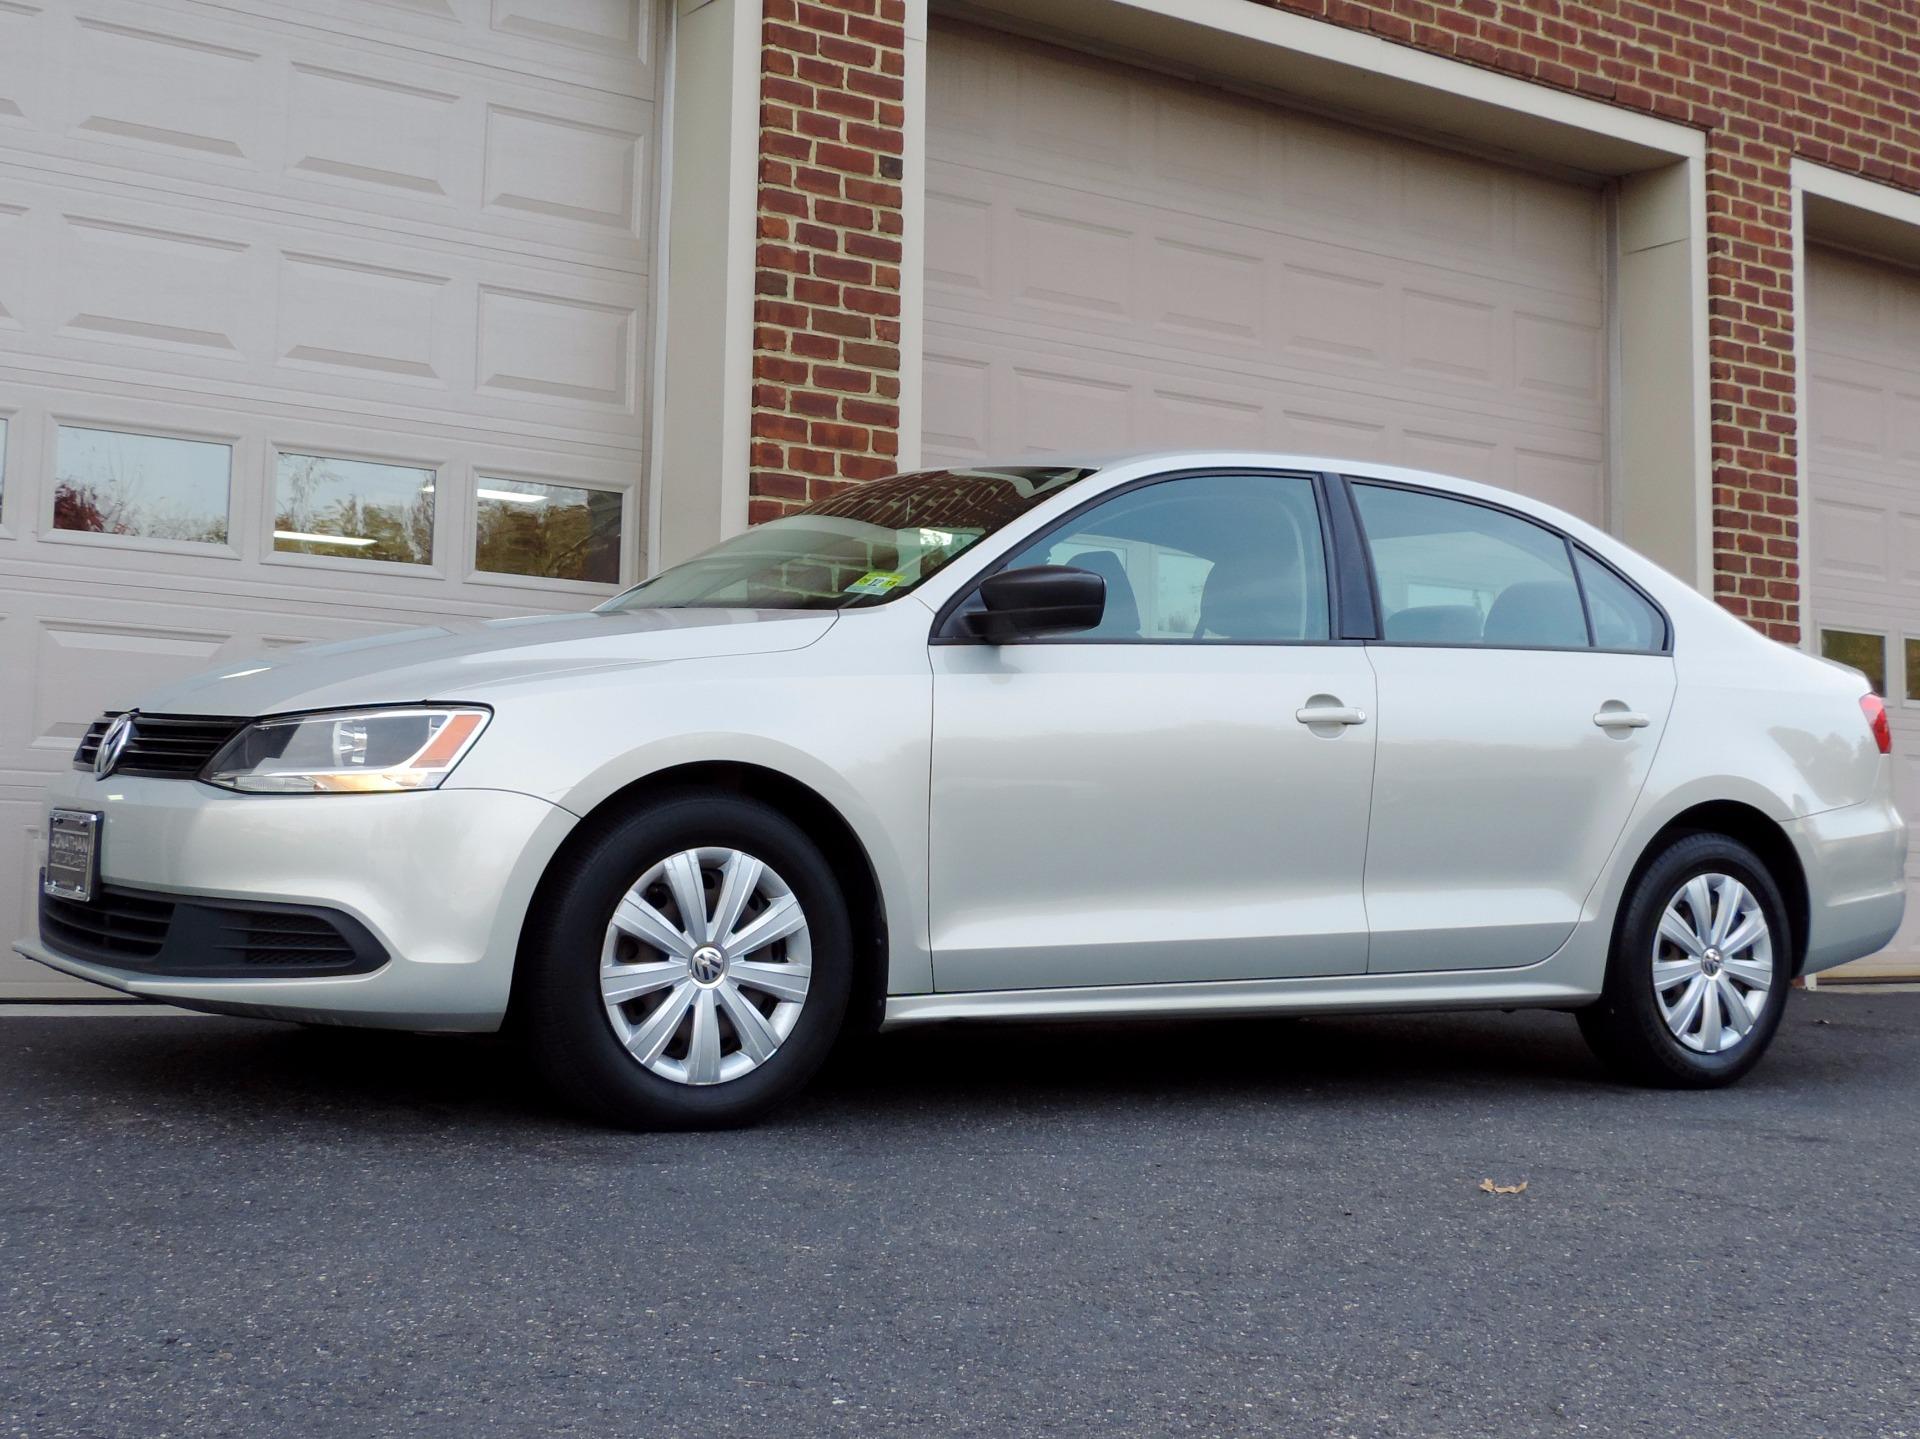 2011 Volkswagen Jetta Stock for sale near Edgewater Park